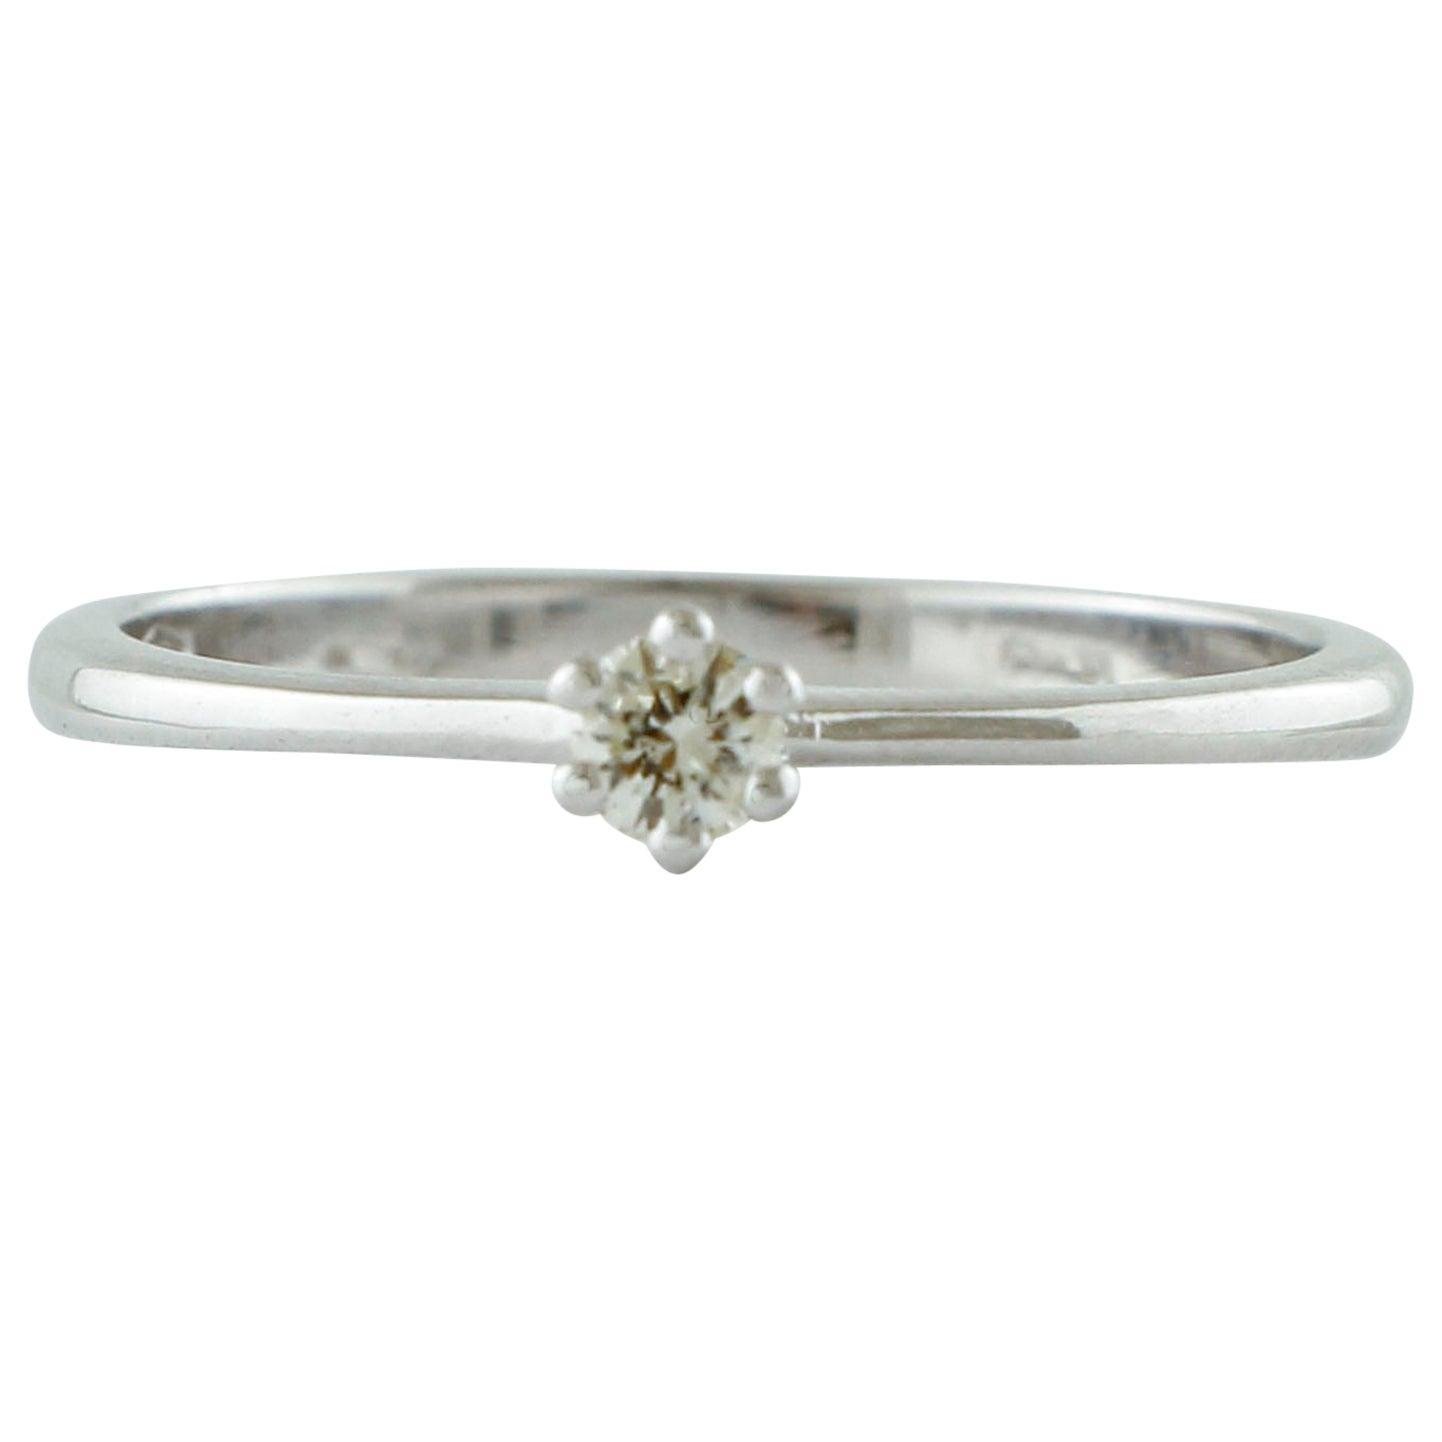 Diamond, 18 Karat White Gold Solitaire/ Engagement Ring